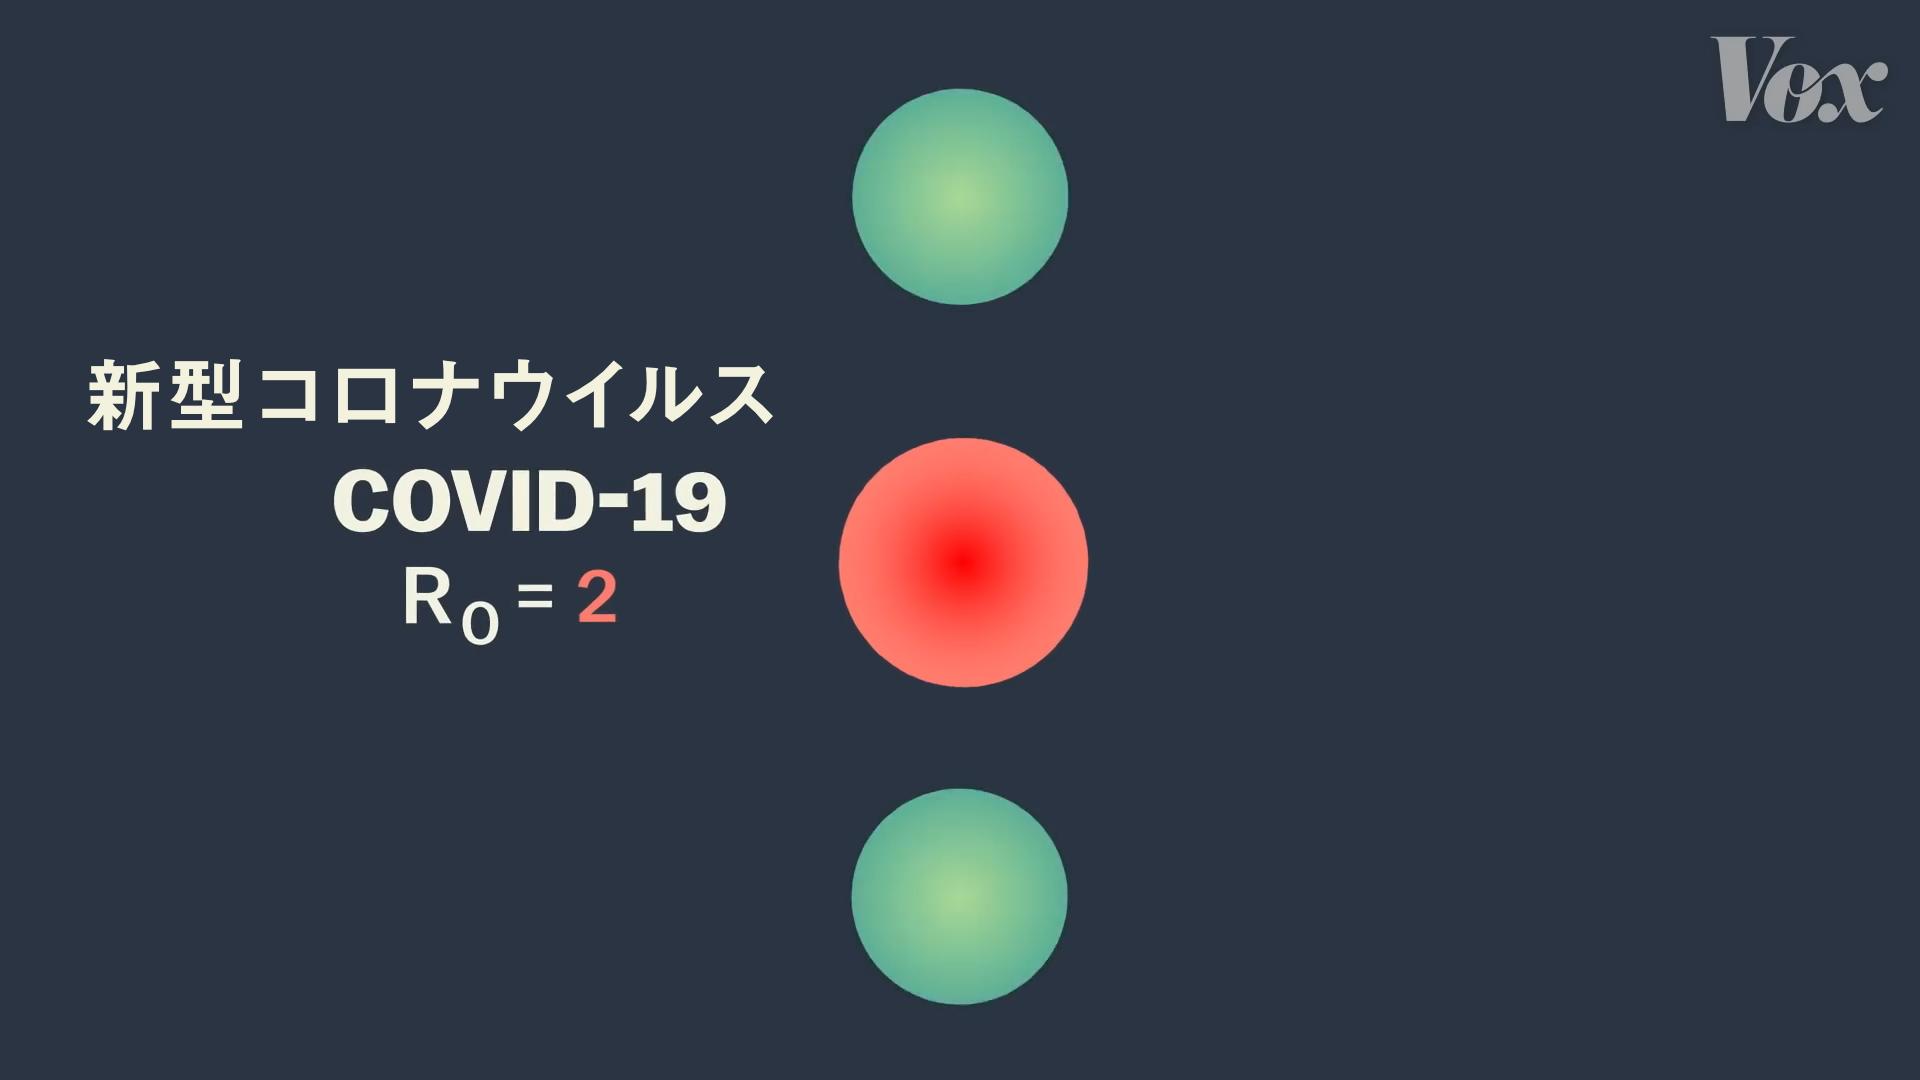 f:id:Imamura:20200408133151p:plain